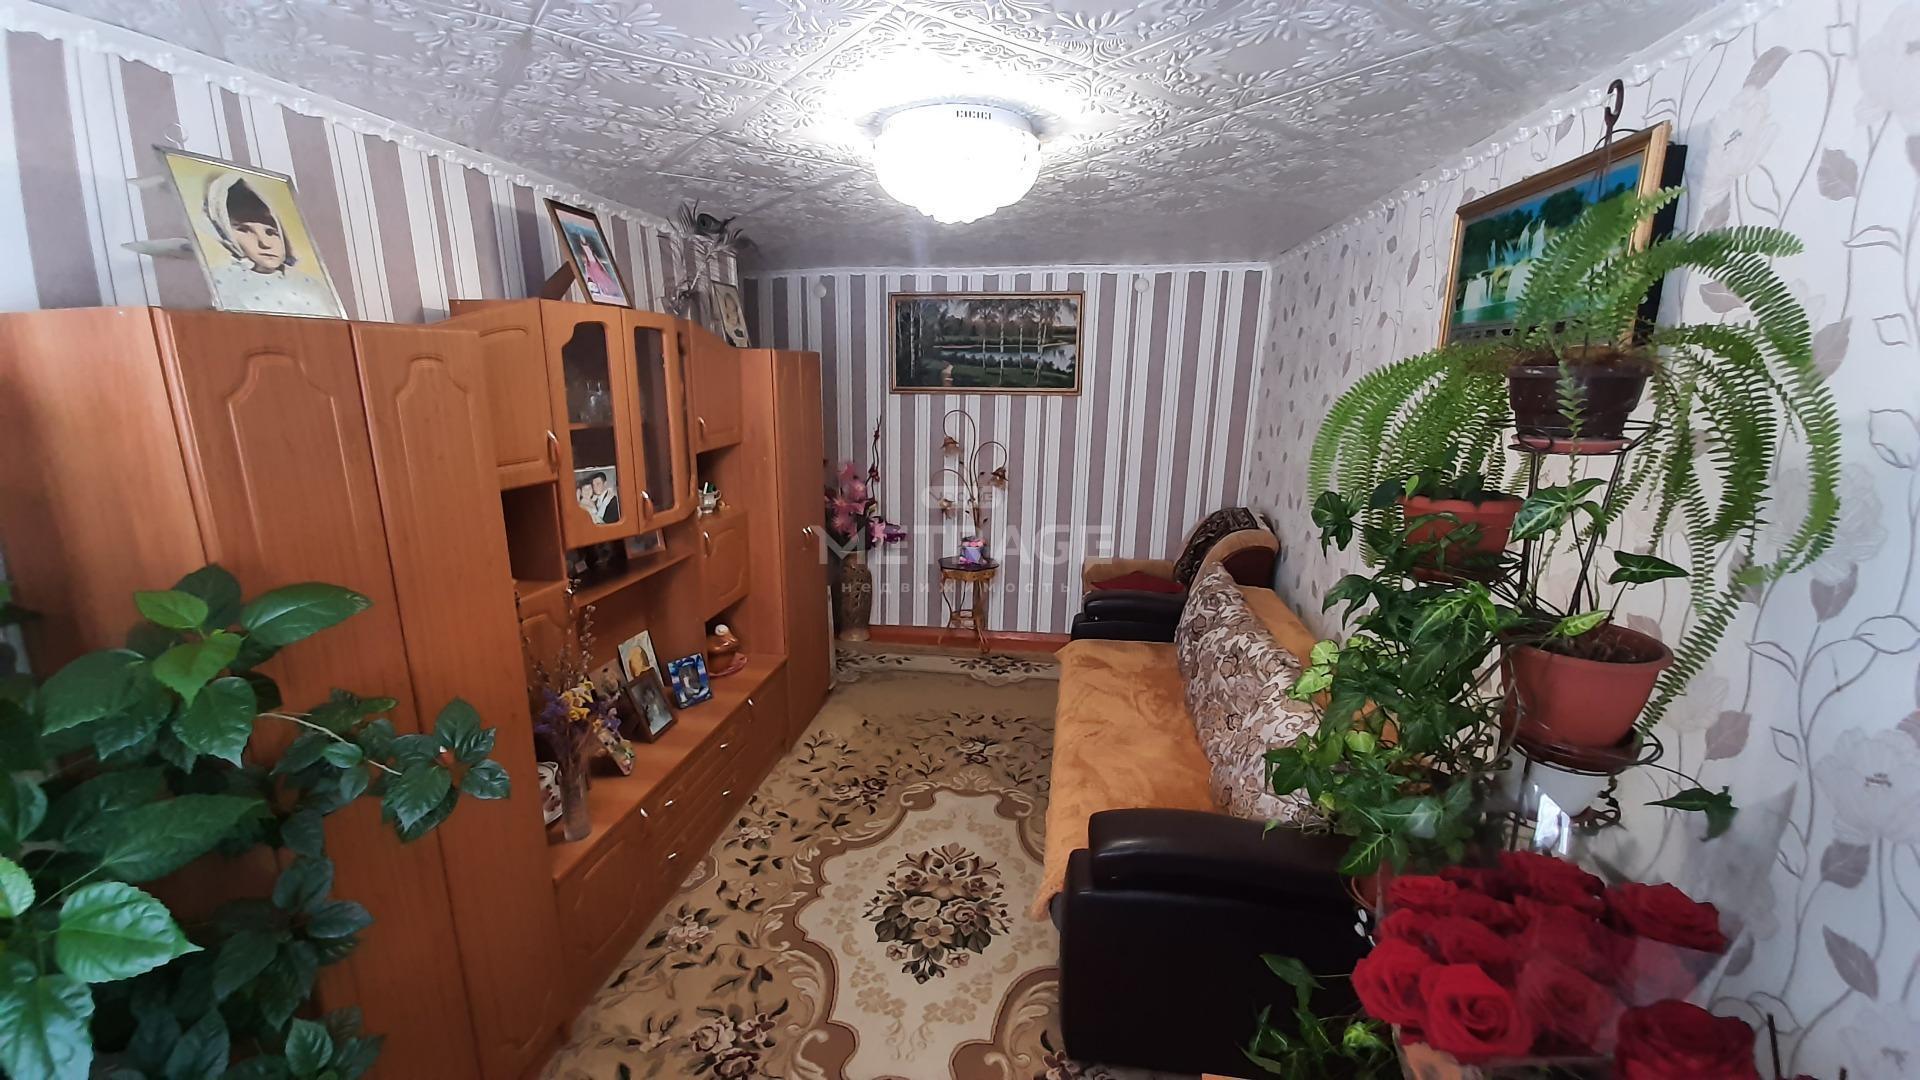 Восточная Станция, Лесная, 1, 2-комнатная квартира